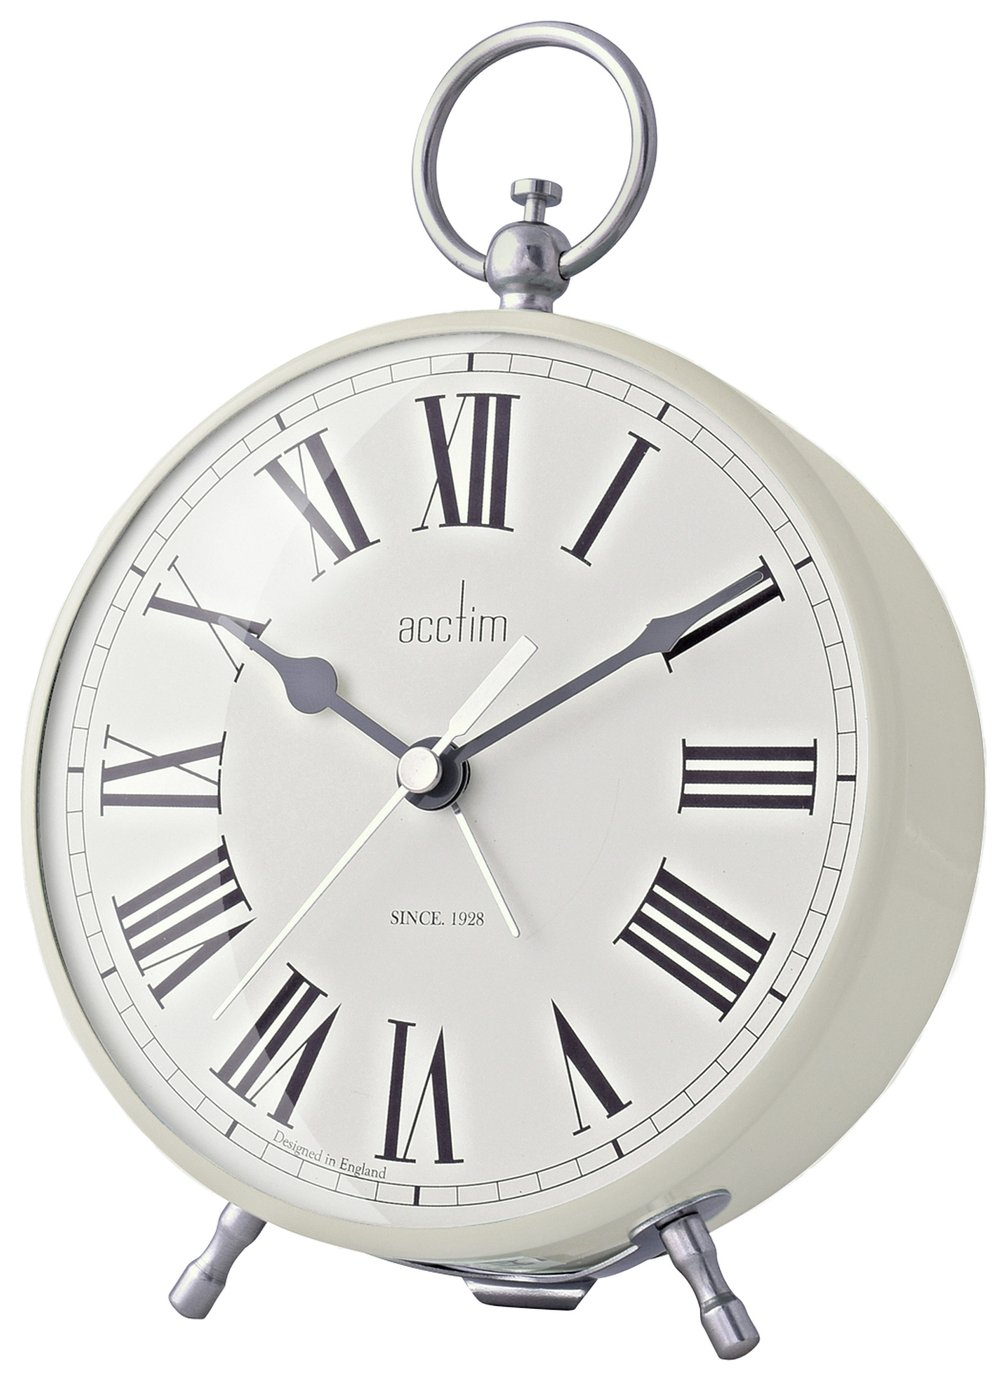 Acctim Caitlin Fob Alarm Clock - Cream